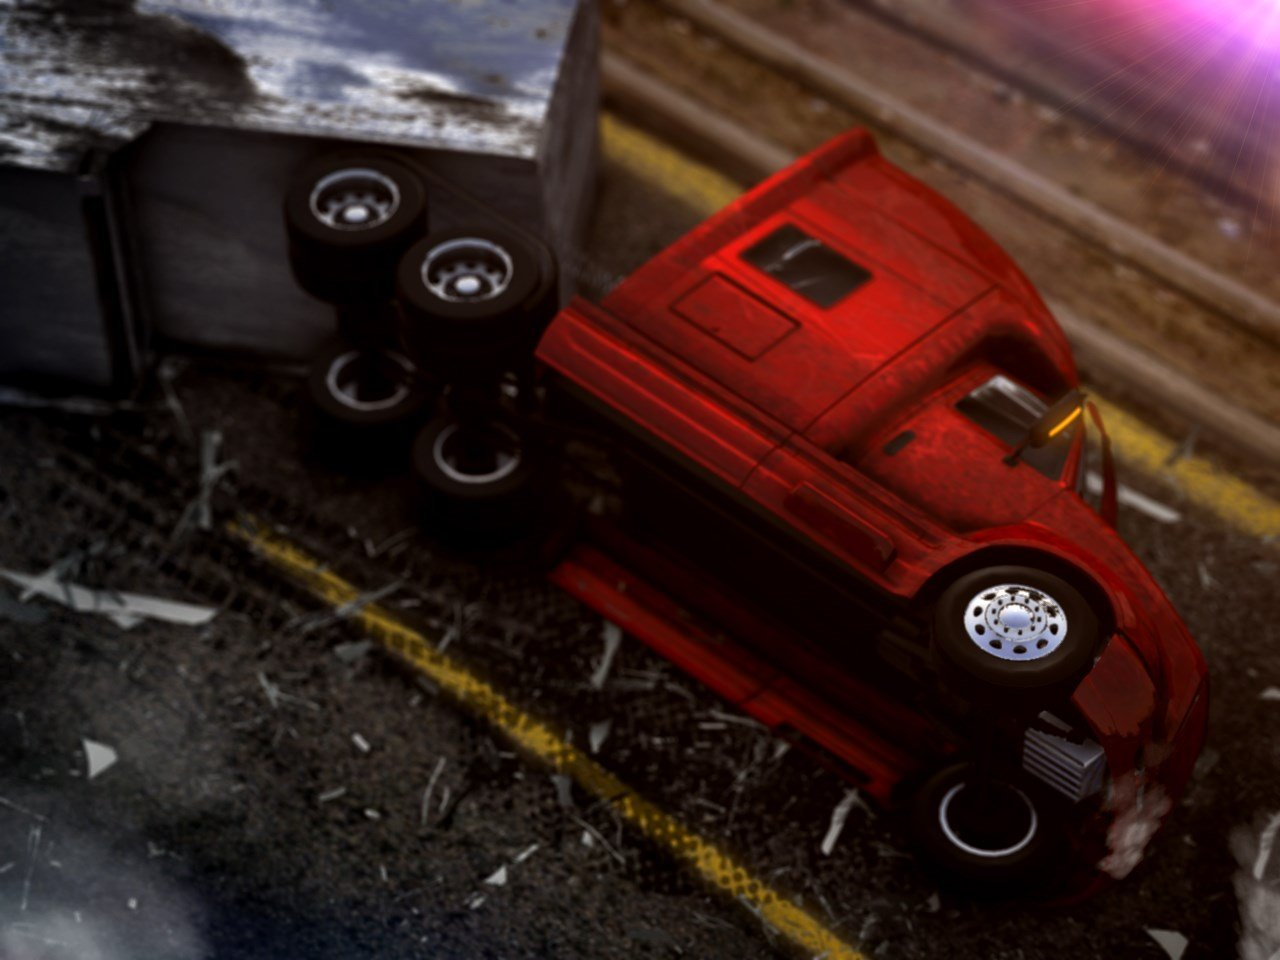 Kansas gove county grinnell - Kake Com Wichita Kansas News Weather Sports Semi Driver Killed In I 70 Crash